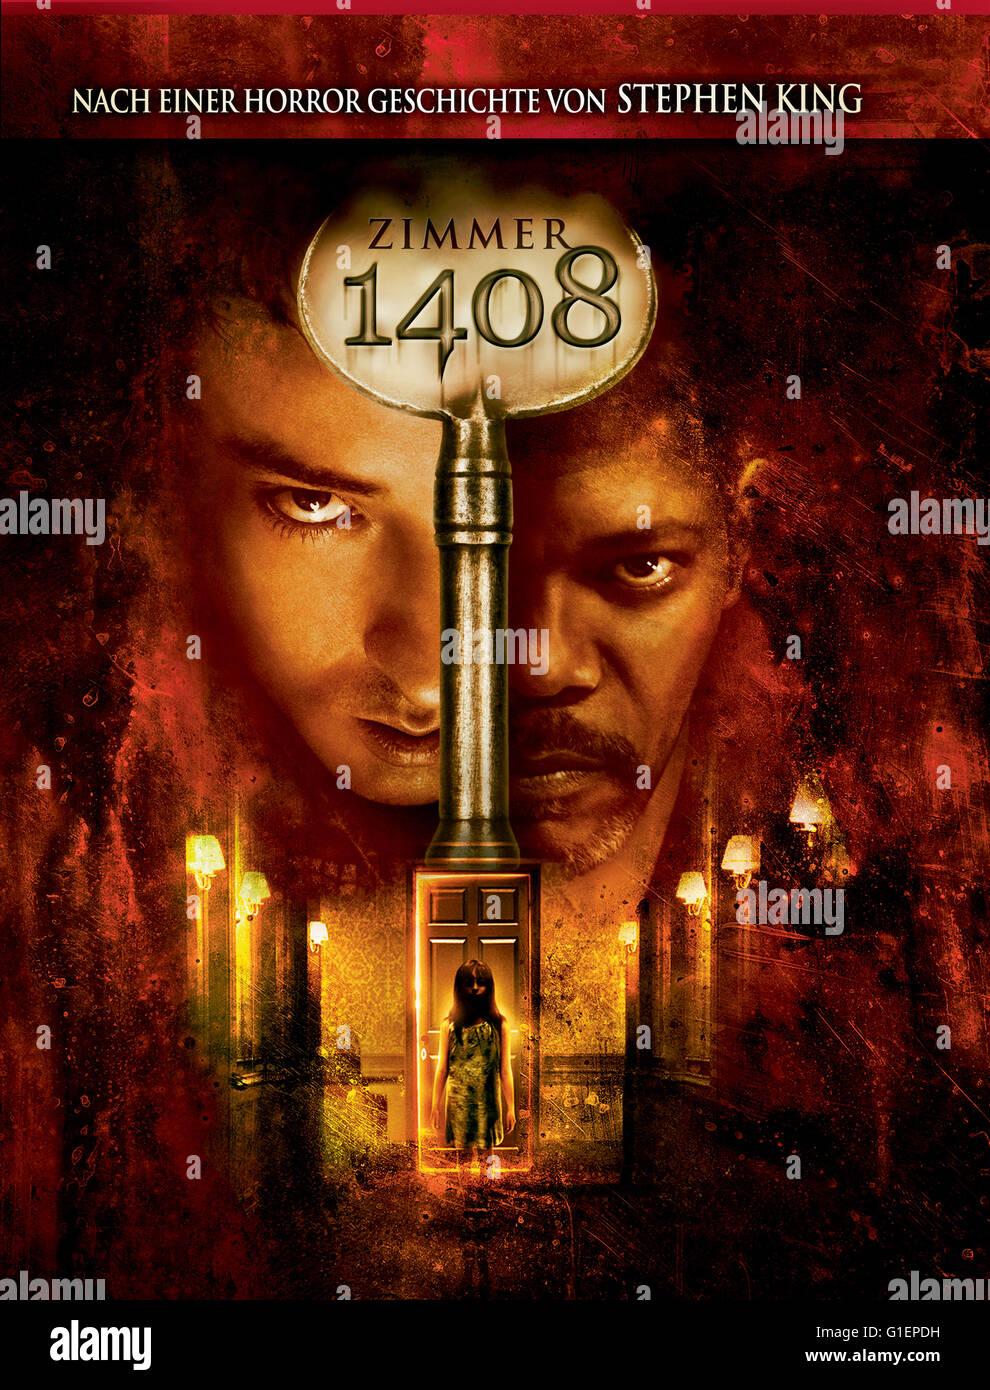 Zimmer 1408, USA 2007, Regie: Mikael Hafström, Kinoplakat Stockbild